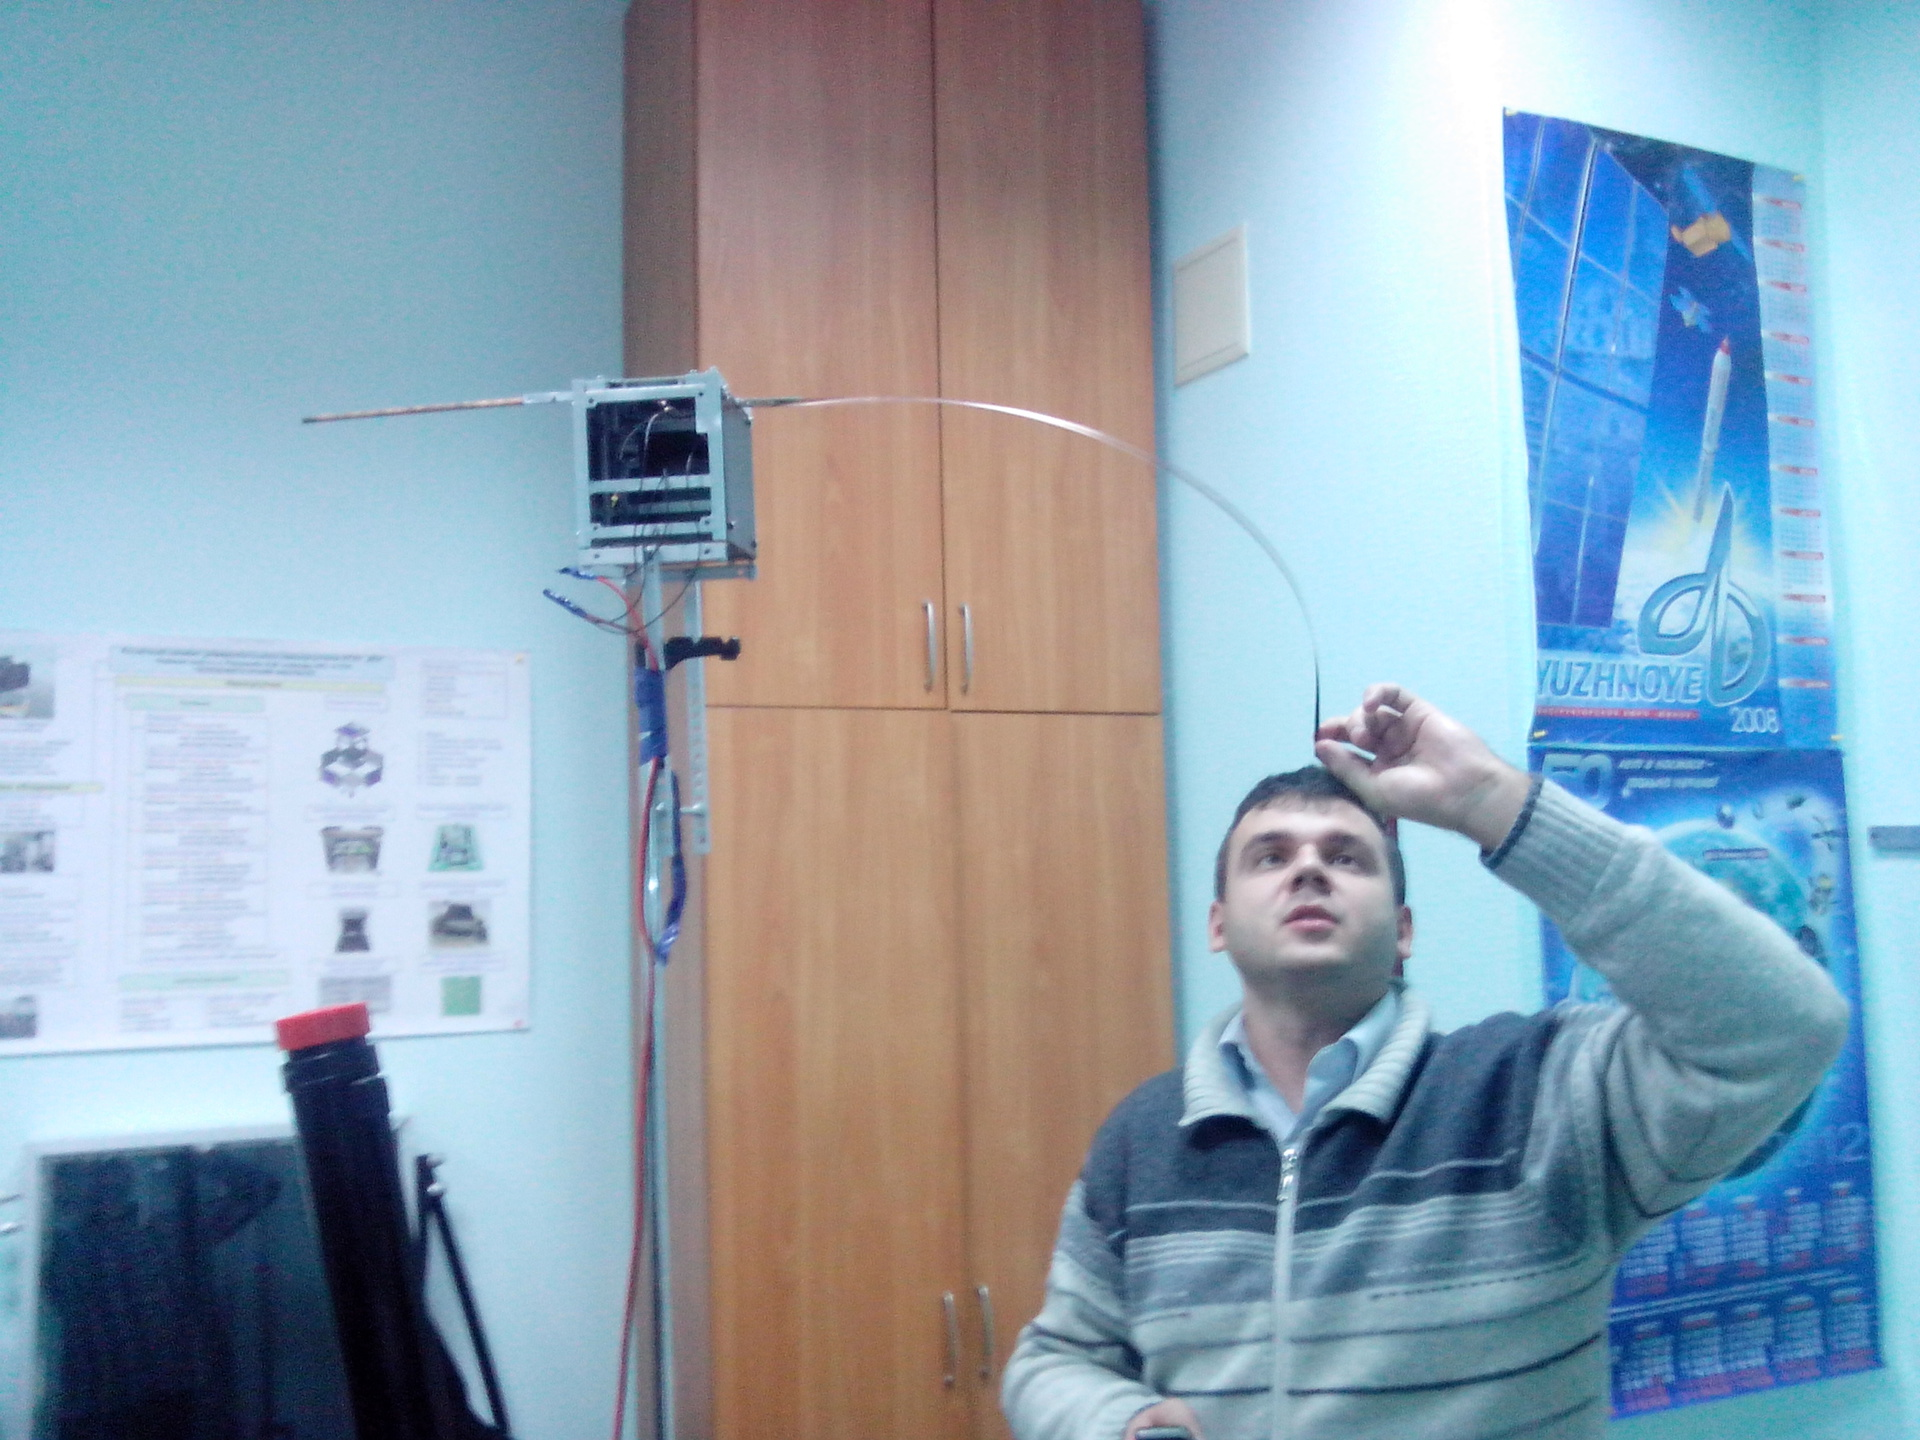 Как рождался PolyITAN 1 в лабораториях КПИ